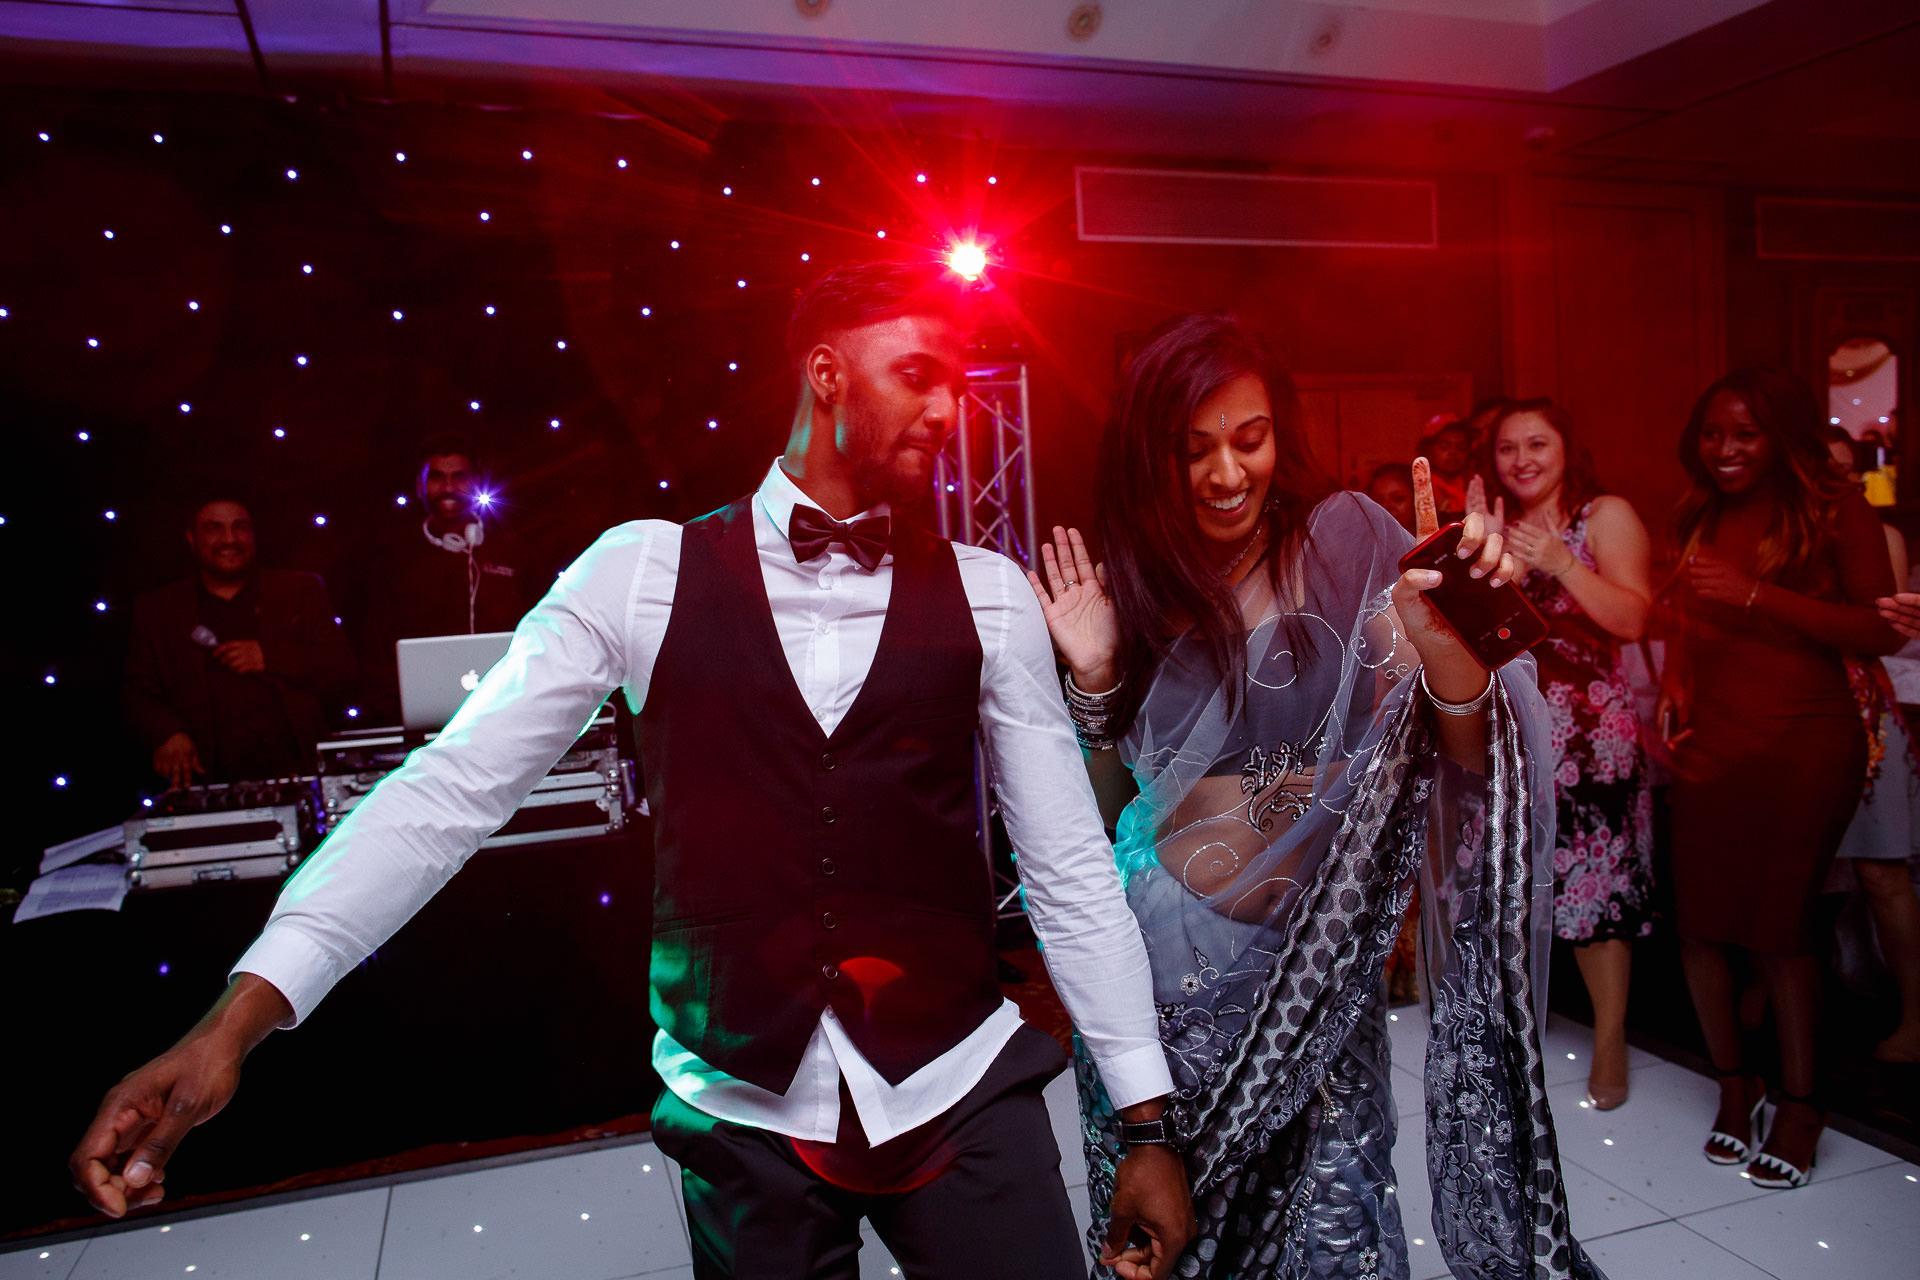 Tamil Wedding Photographer London 1